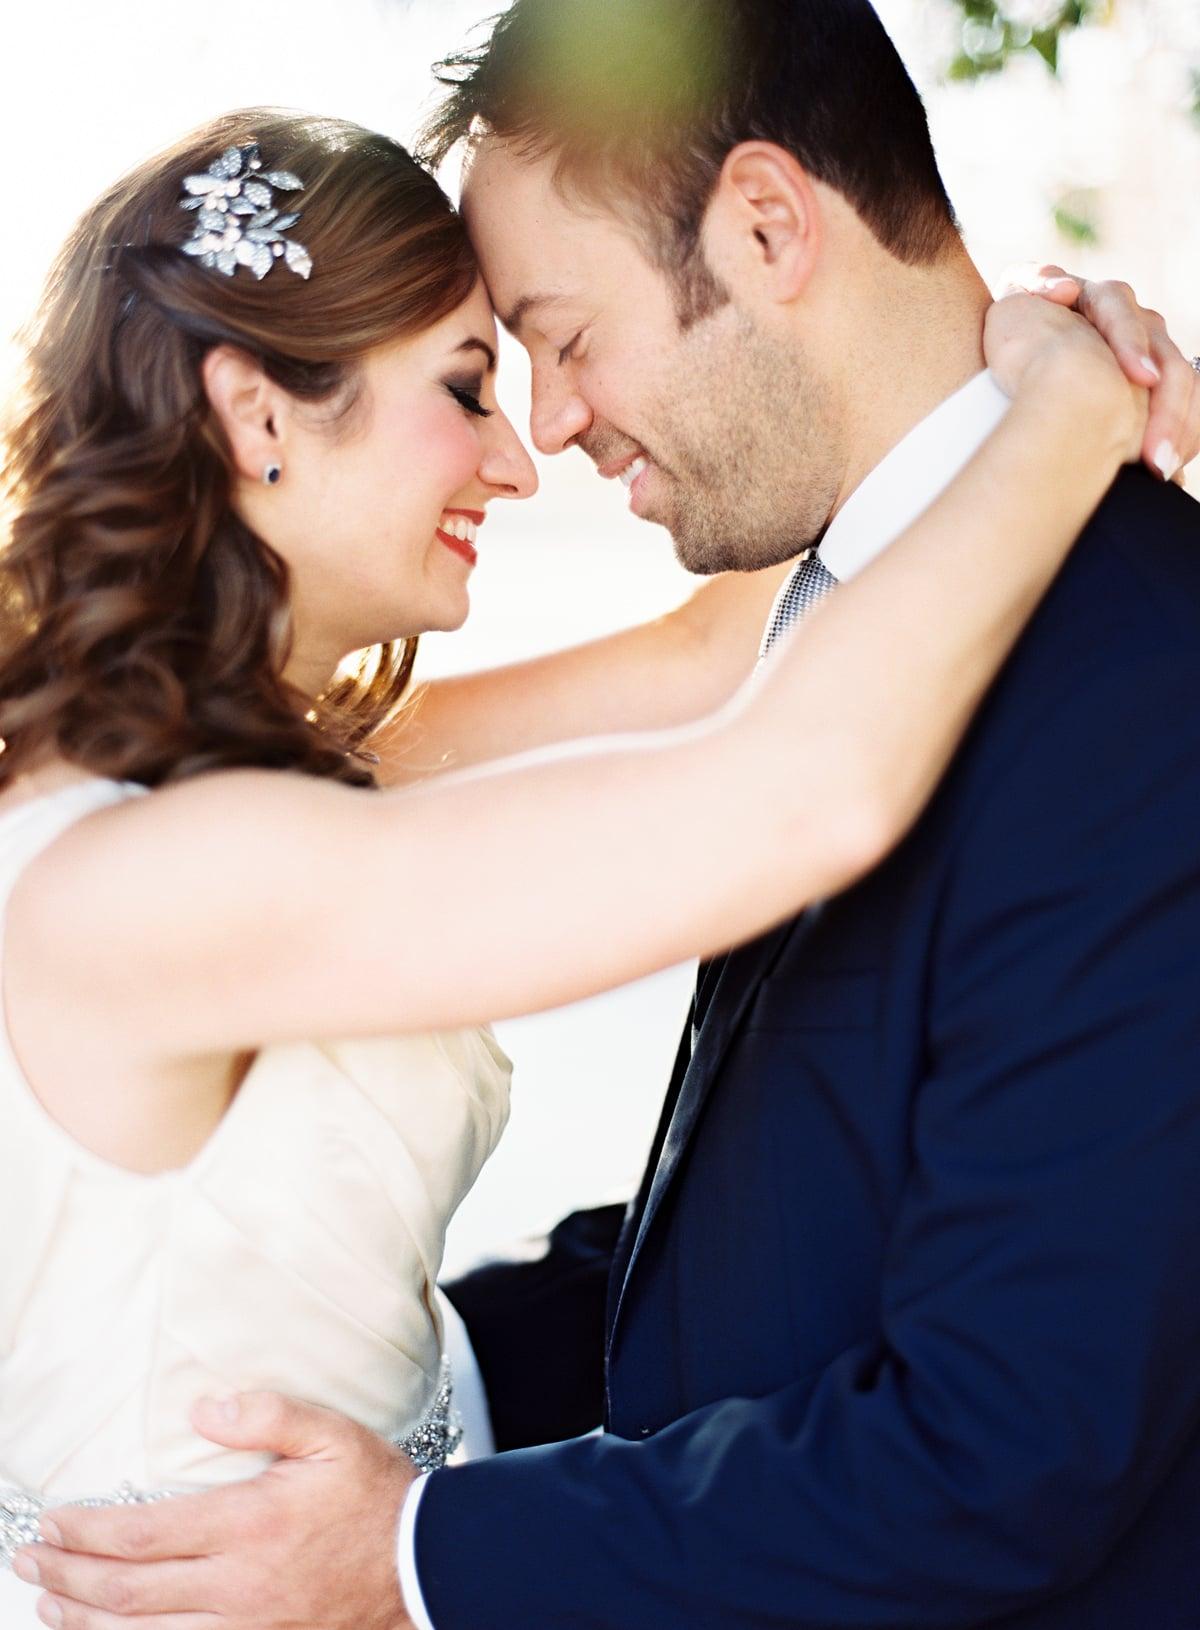 clifton-inn-wedding-029.jpg